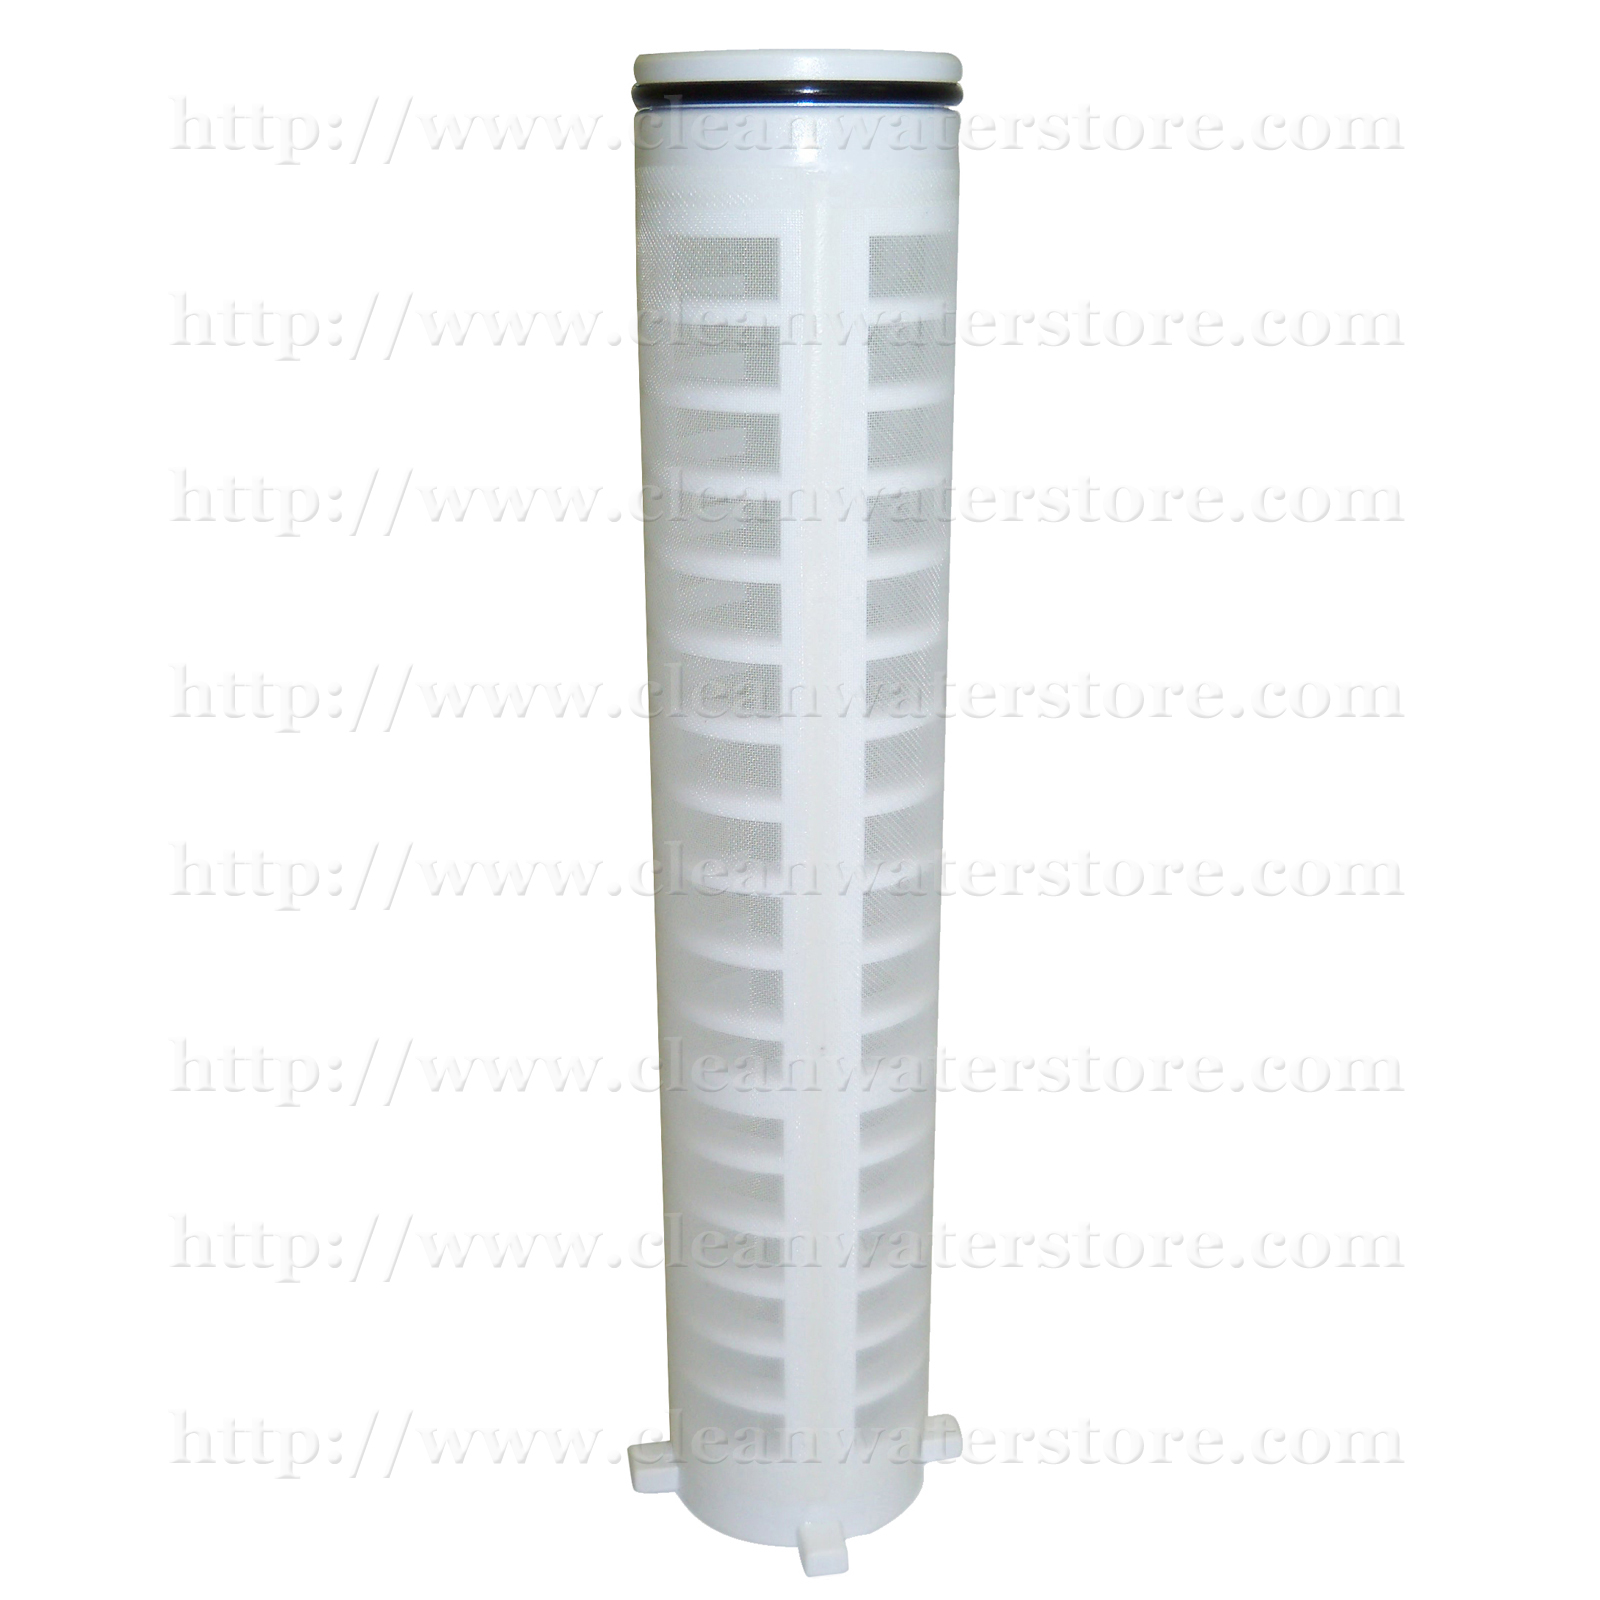 Rusco FS 1-1//2-500 1 1//2 500 mesh screen